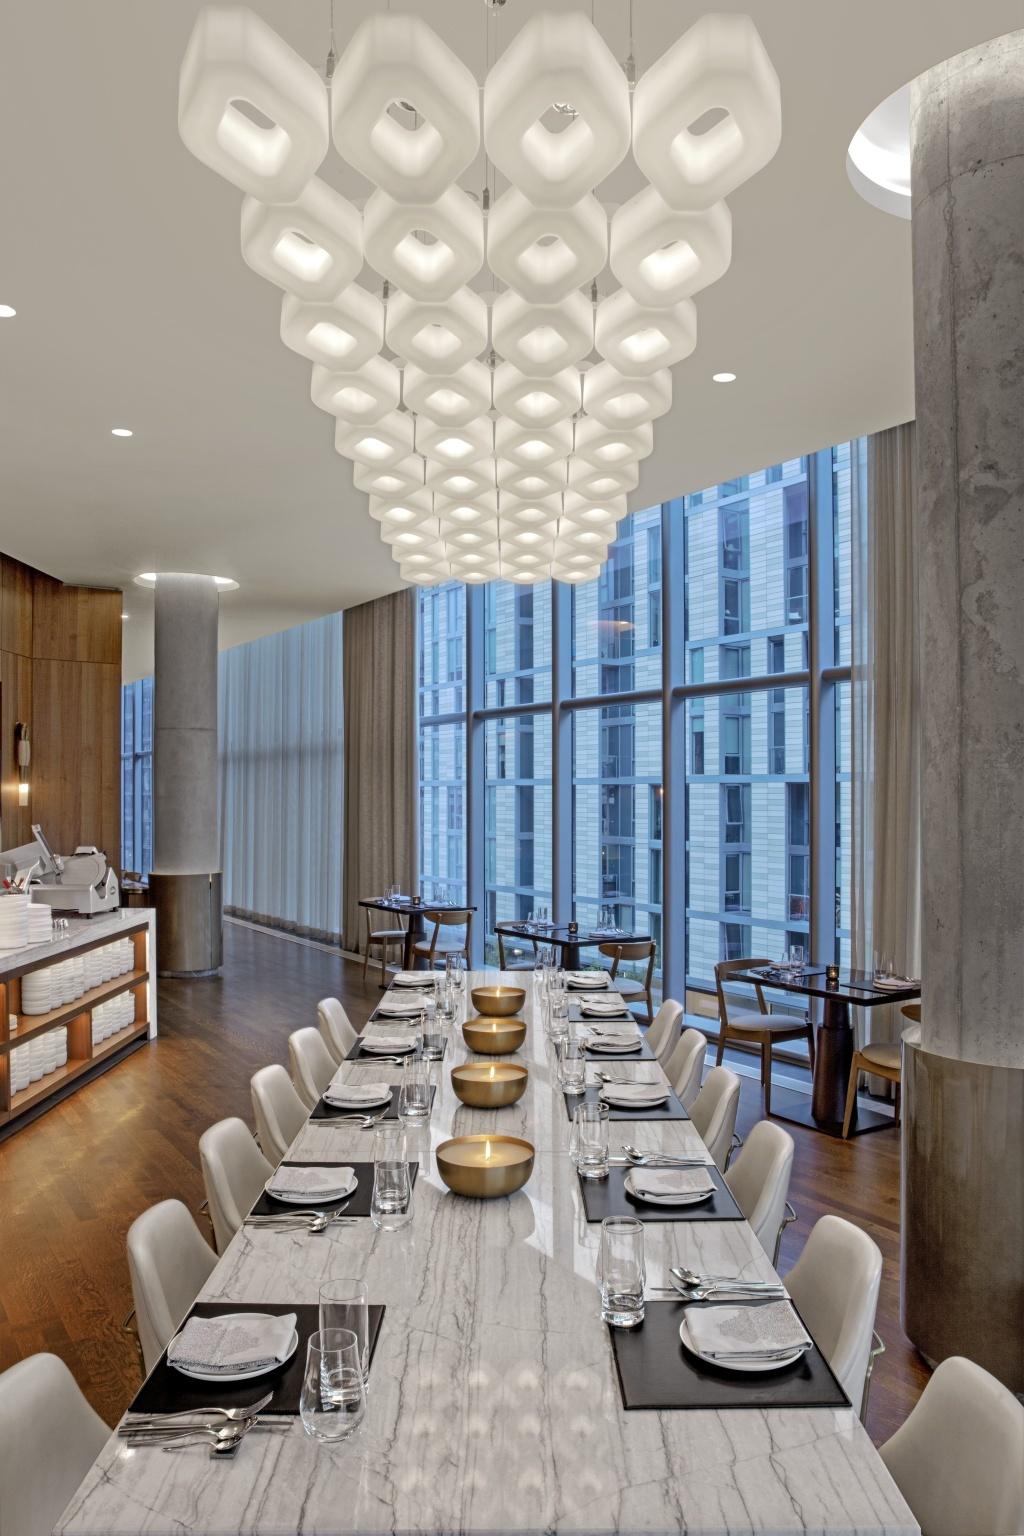 Preciosa Lighting - Conrad hotel Washington 5